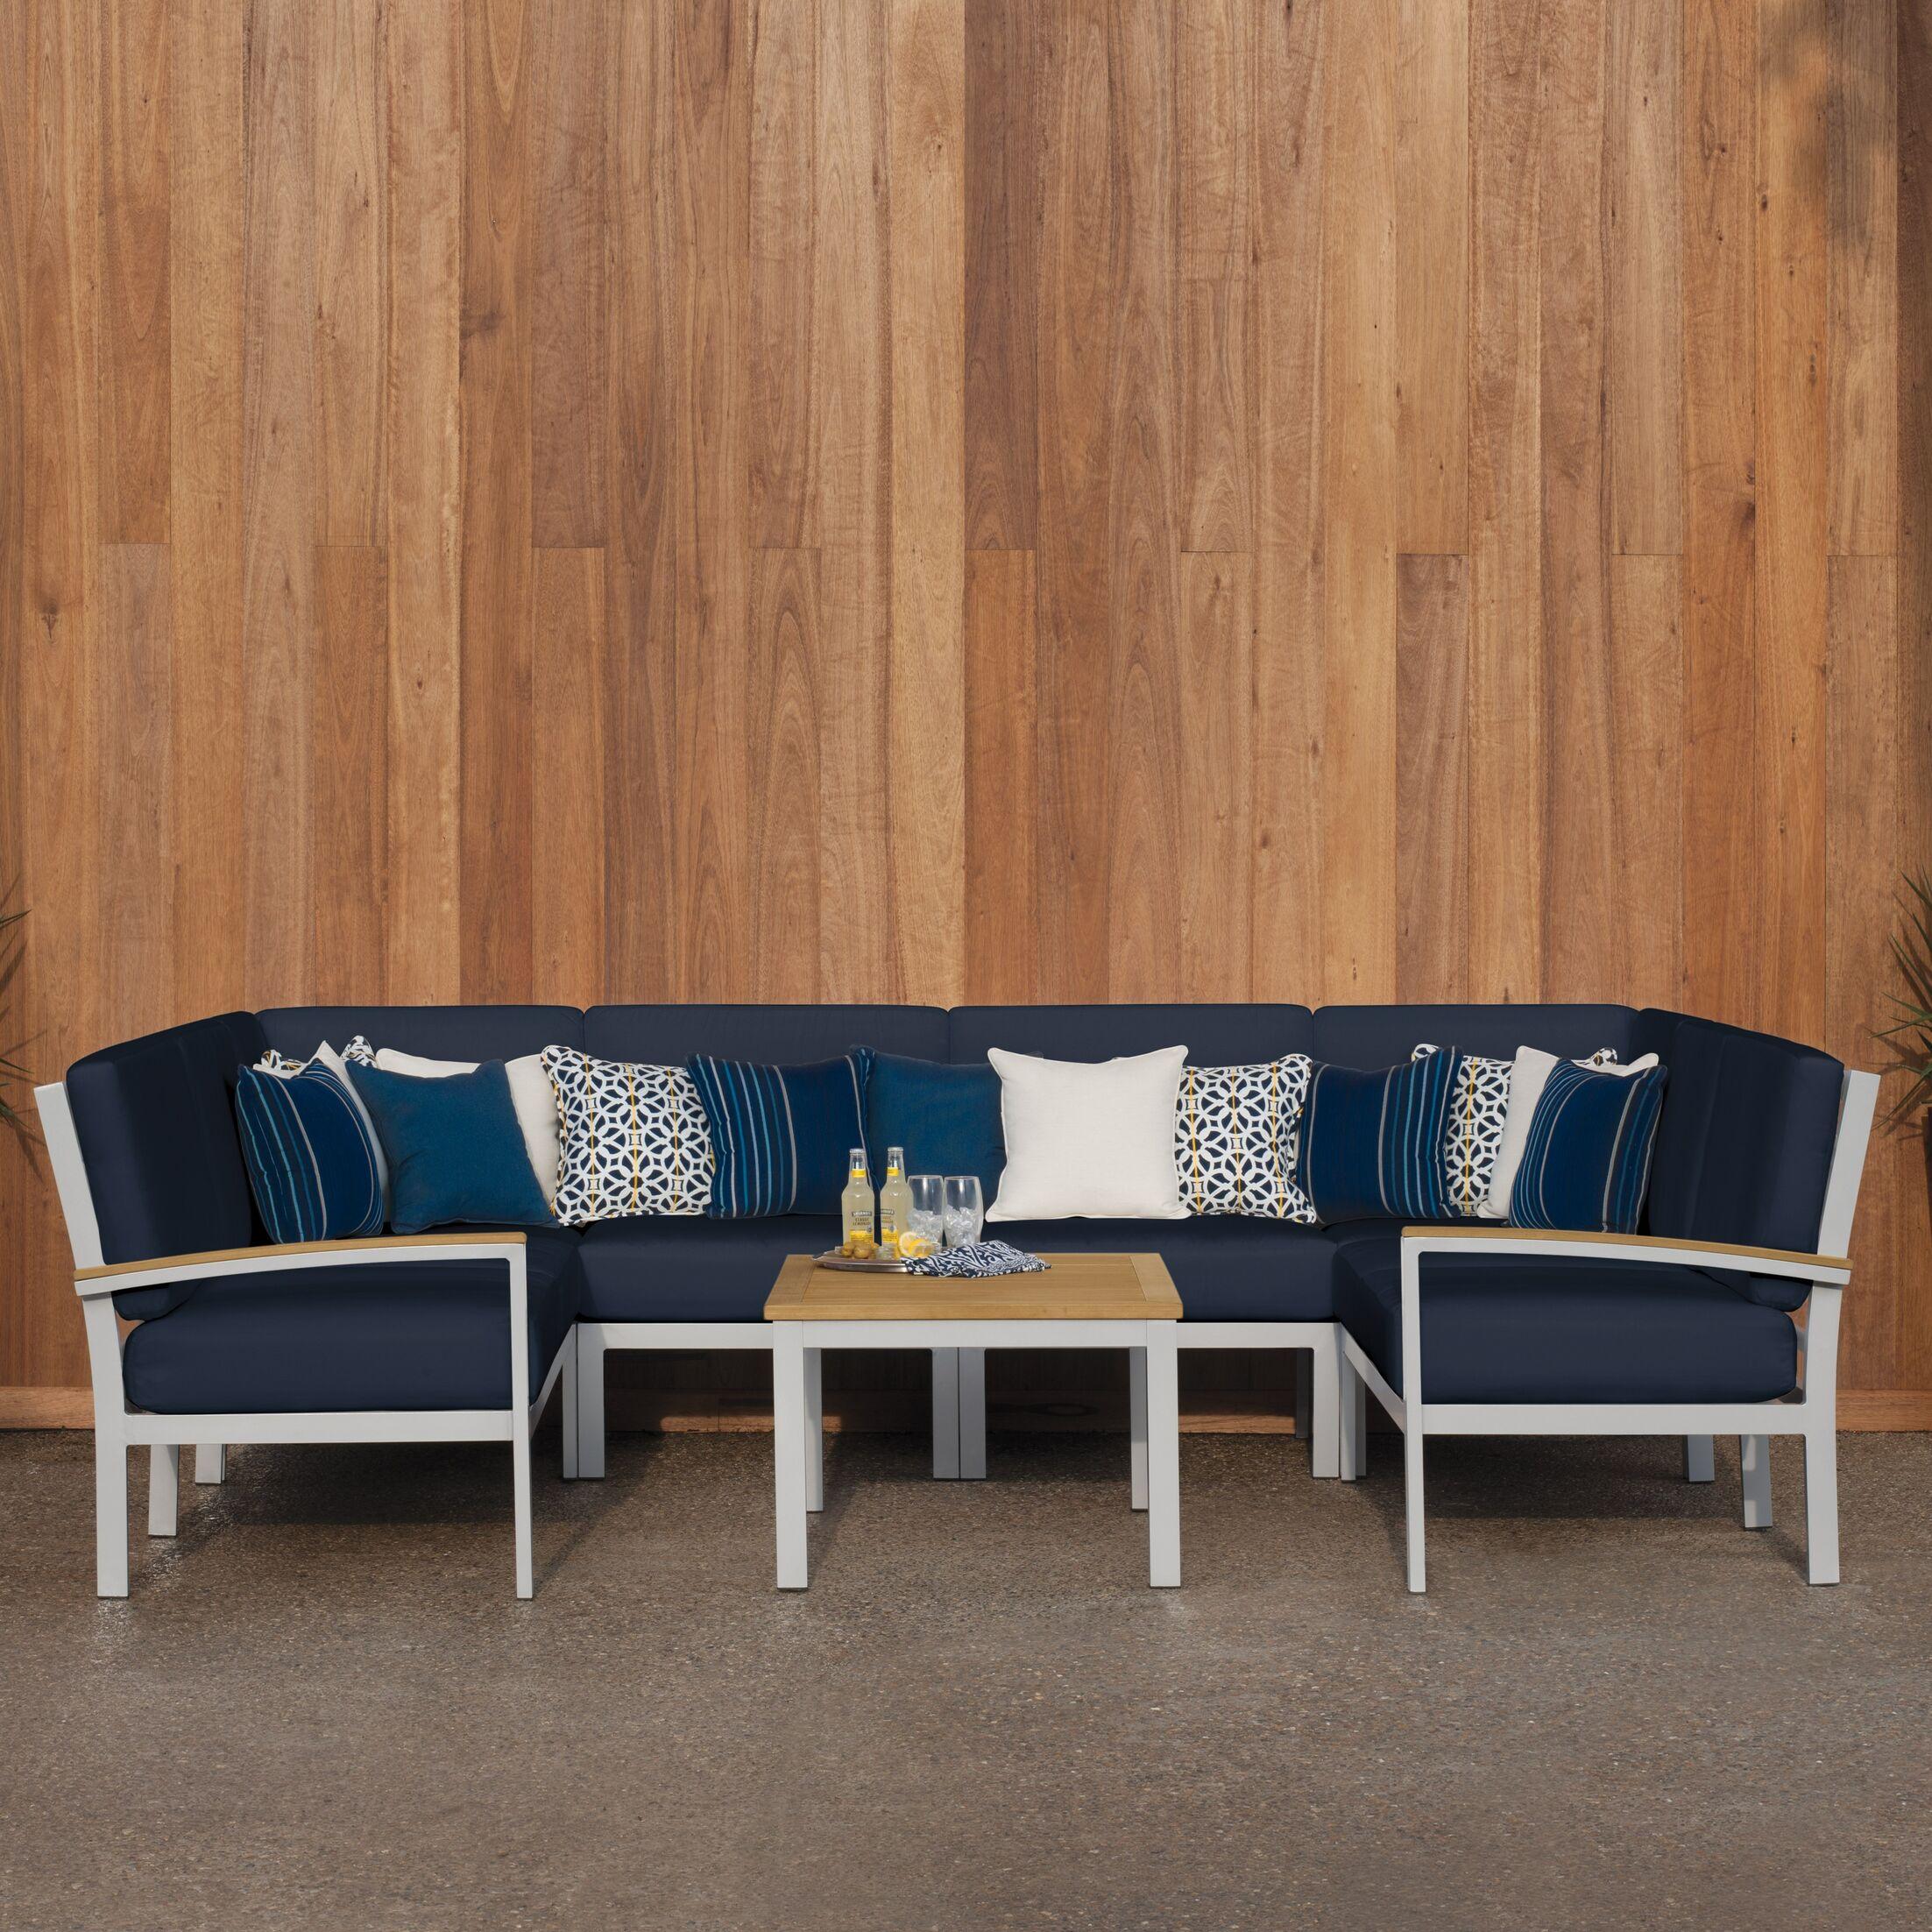 Farmington  Piece Sectional Set with Cushions Fabric: Midnight Blue, Color: Natural Tekwood